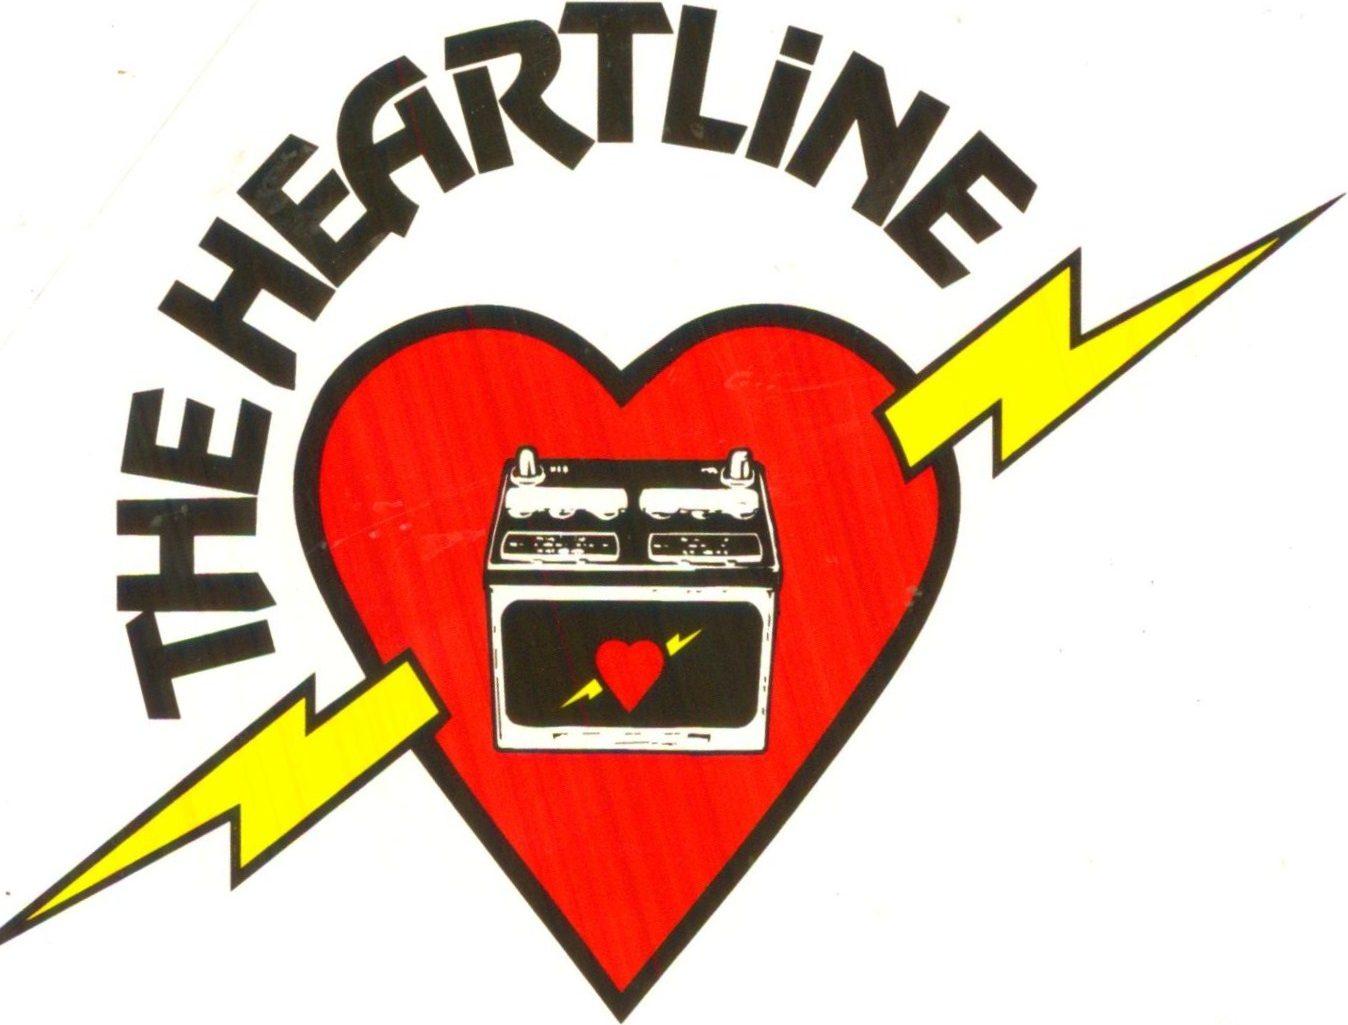 The Heartline